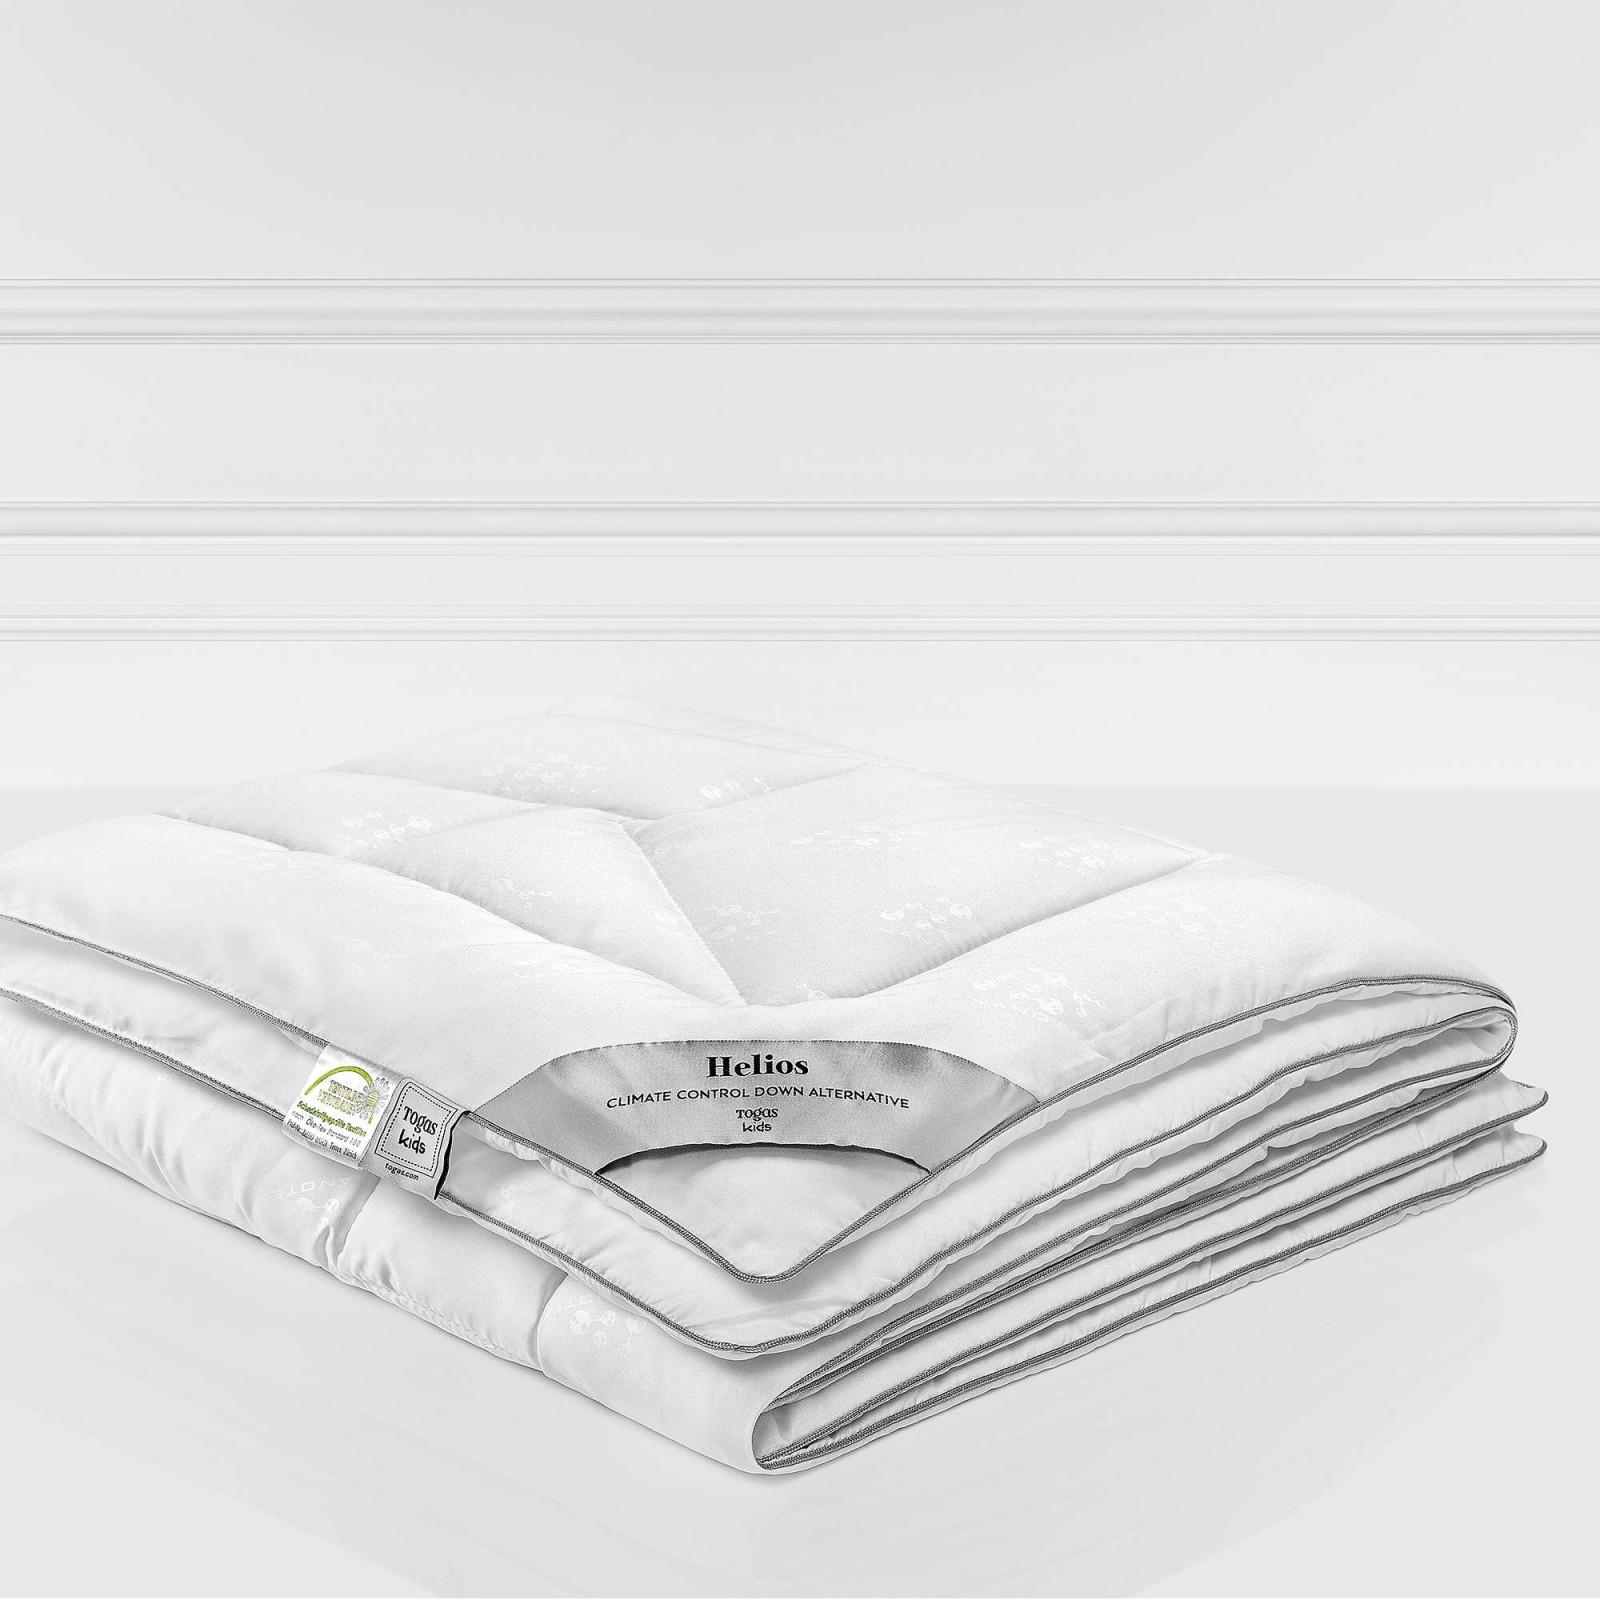 Детские покрывала, подушки, одеяла Togas Детское одеяло Гелиос (100х135 см) одеяла togas одеяло гелиос 220х240 см